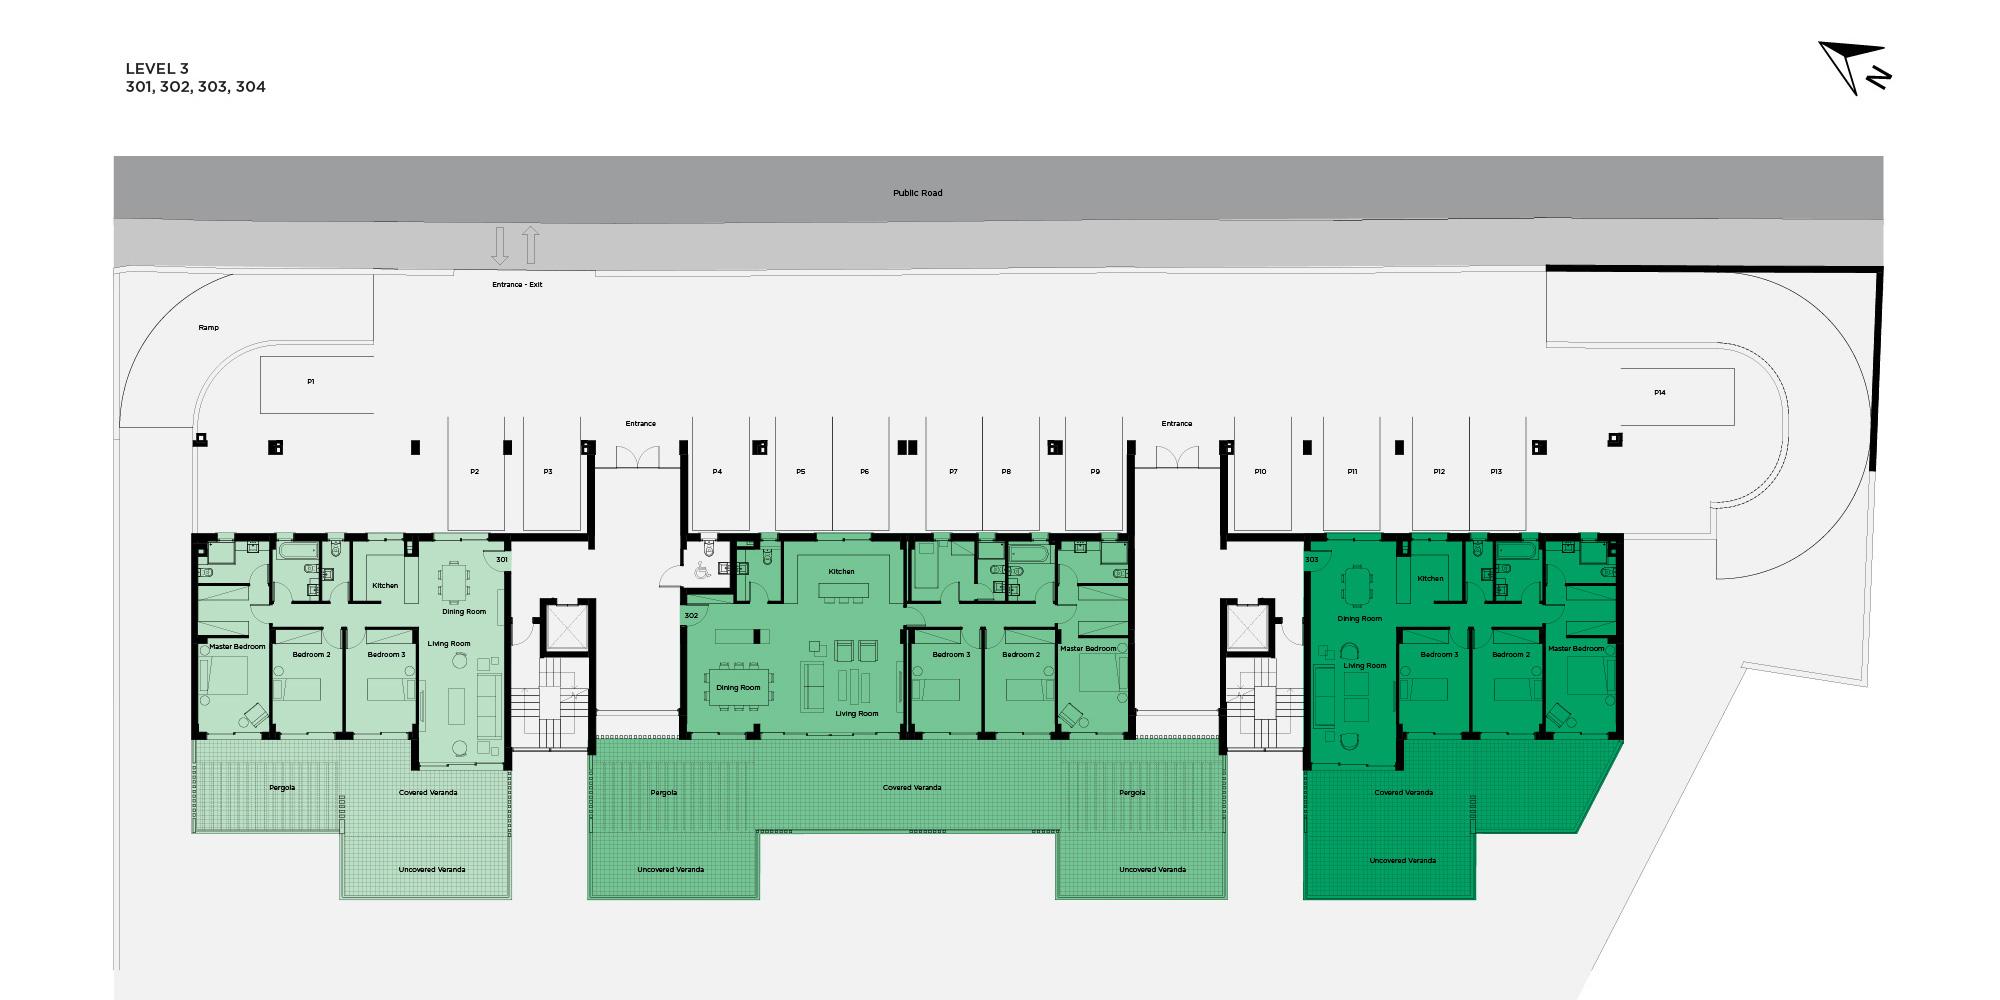 pantheon hill level 3 floorplan